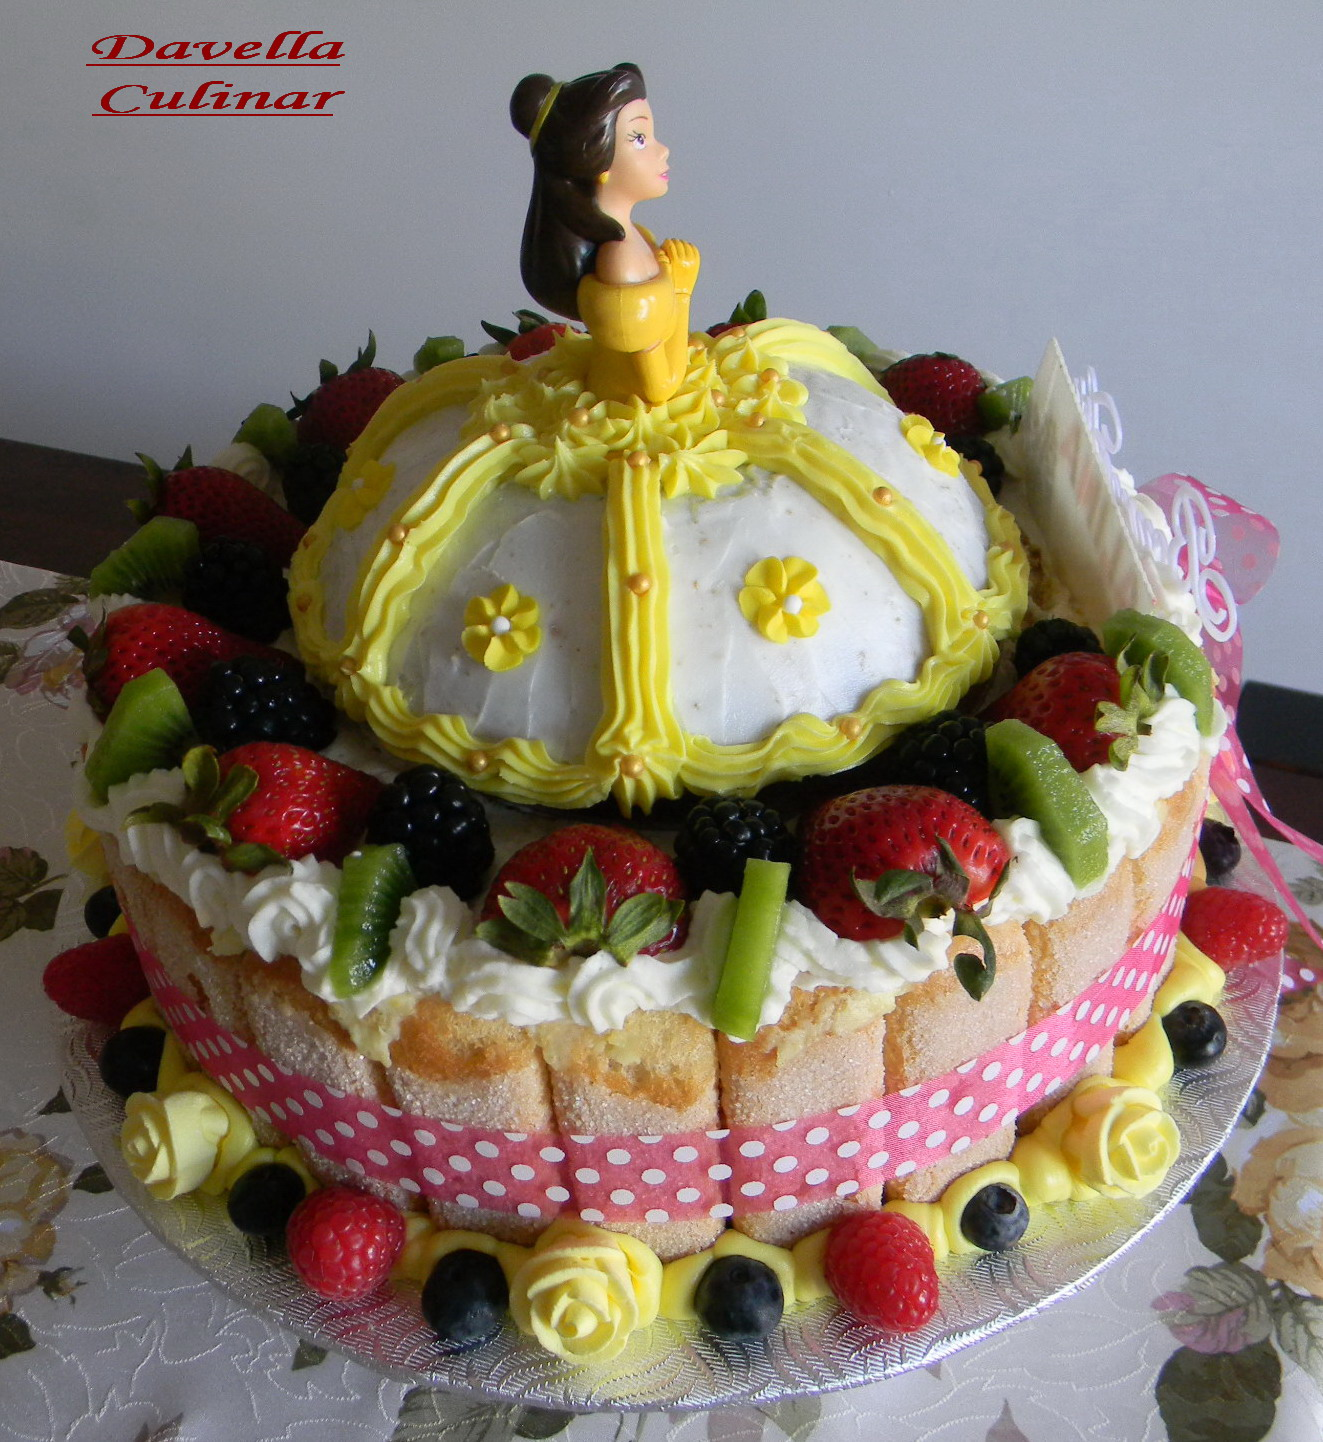 Davella culinar g teau la belle princesse alina tort printesa frumoasa alina - La belle princesse ...